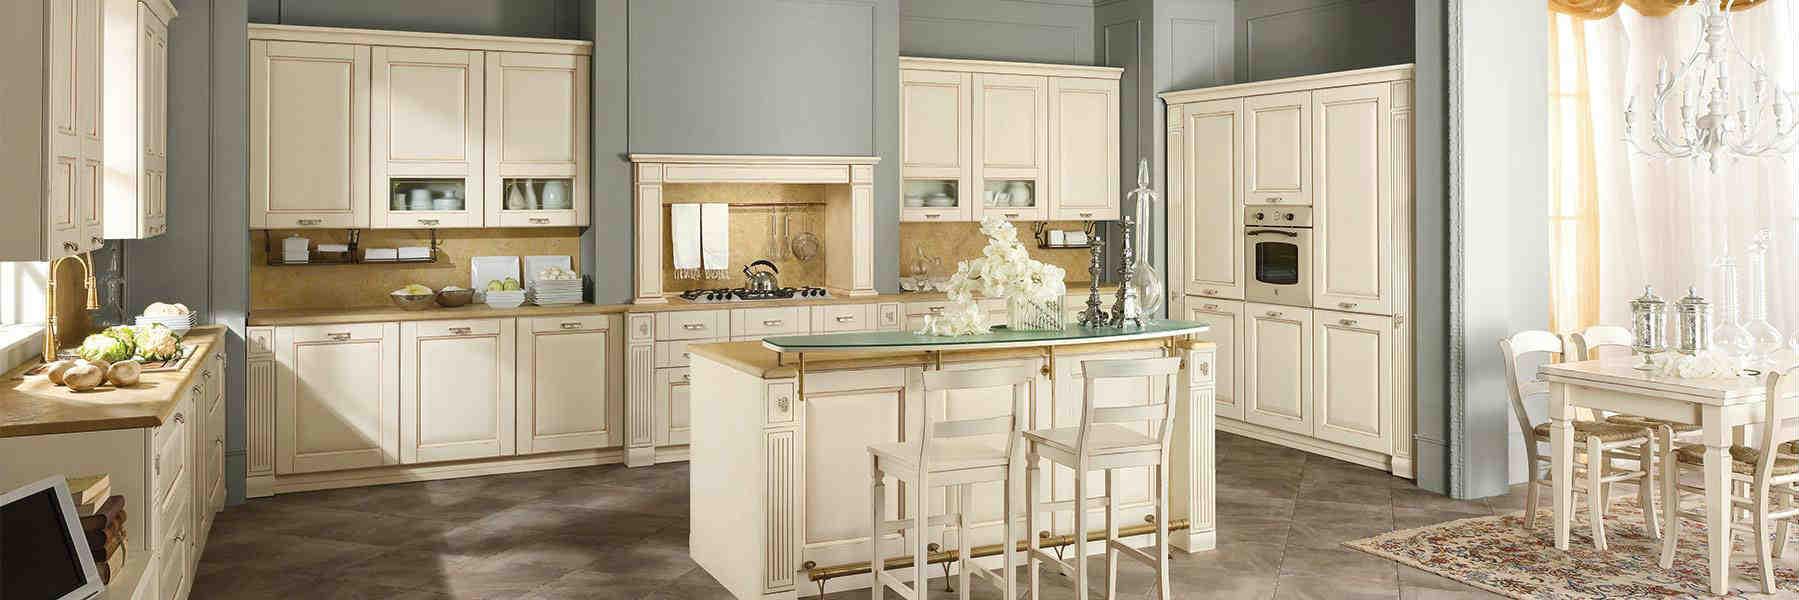 Eurolife - Quality Kitchens Designs Sydney